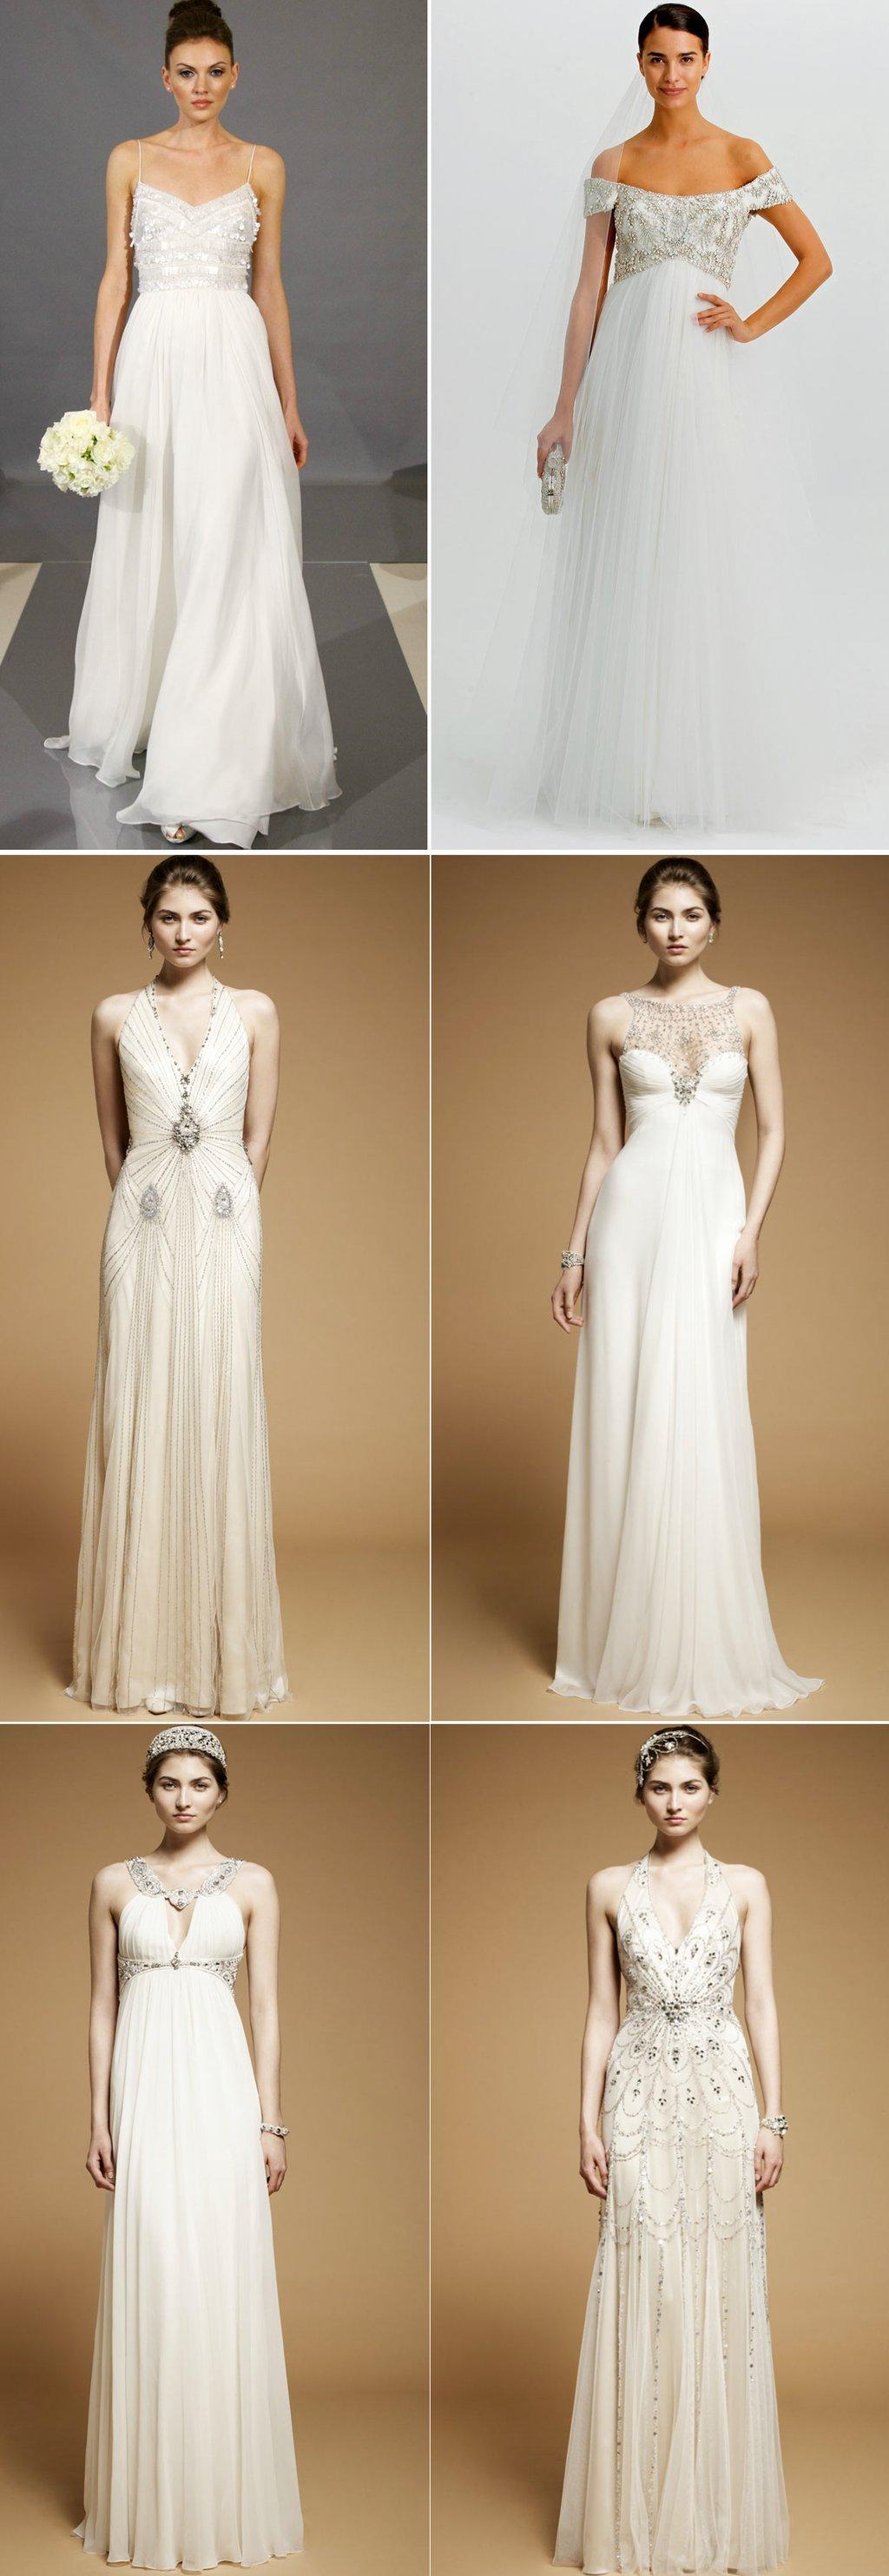 Beaded-wedding-dresses-2012-bridal-gown-marchesa-jenny-packham.full